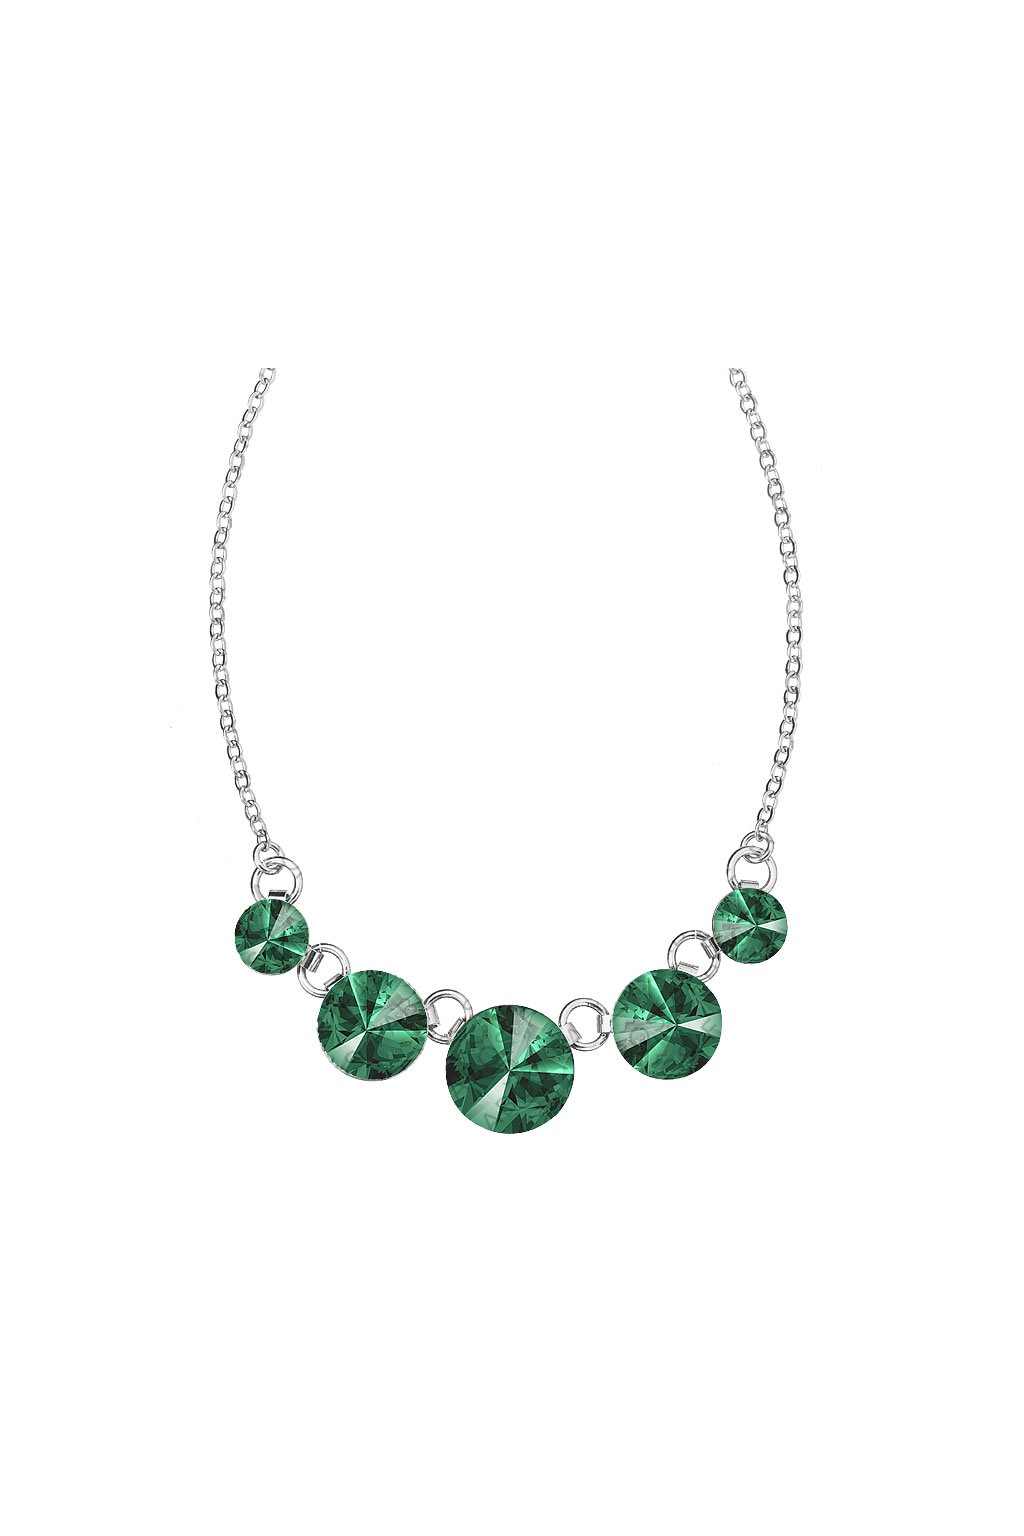 Náhrdelník Rivoli 8-14 Emerald  elements Swarovski